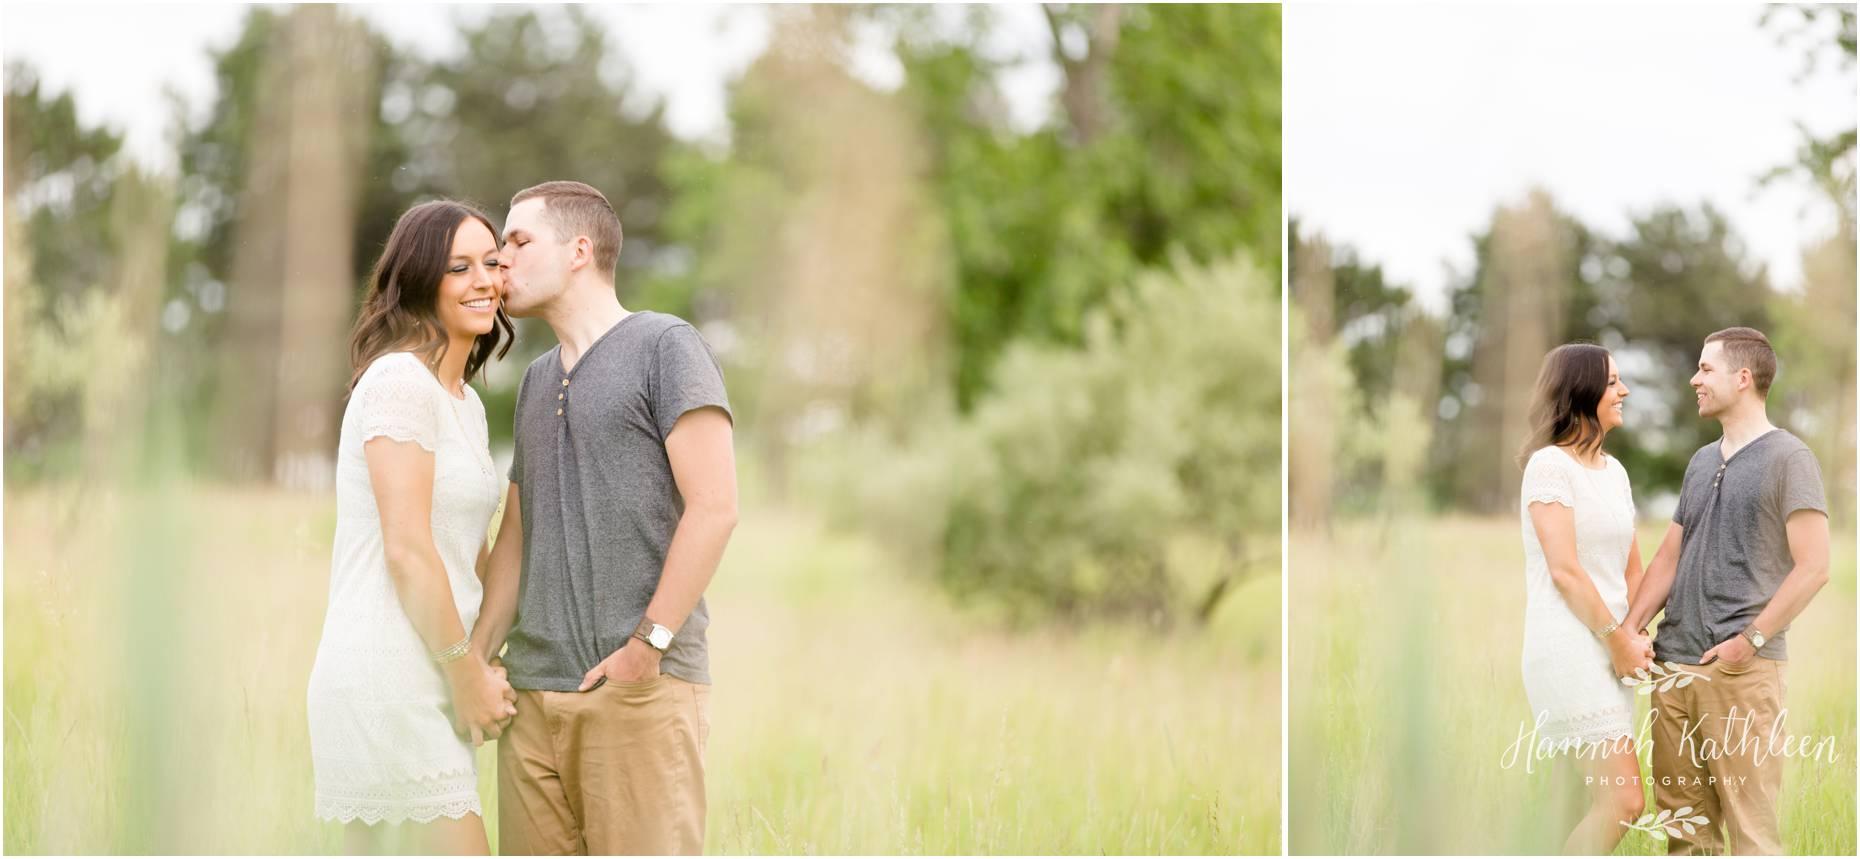 Tifft_Nature_Preserve_Engagement_Photography_Daniel_Marissa